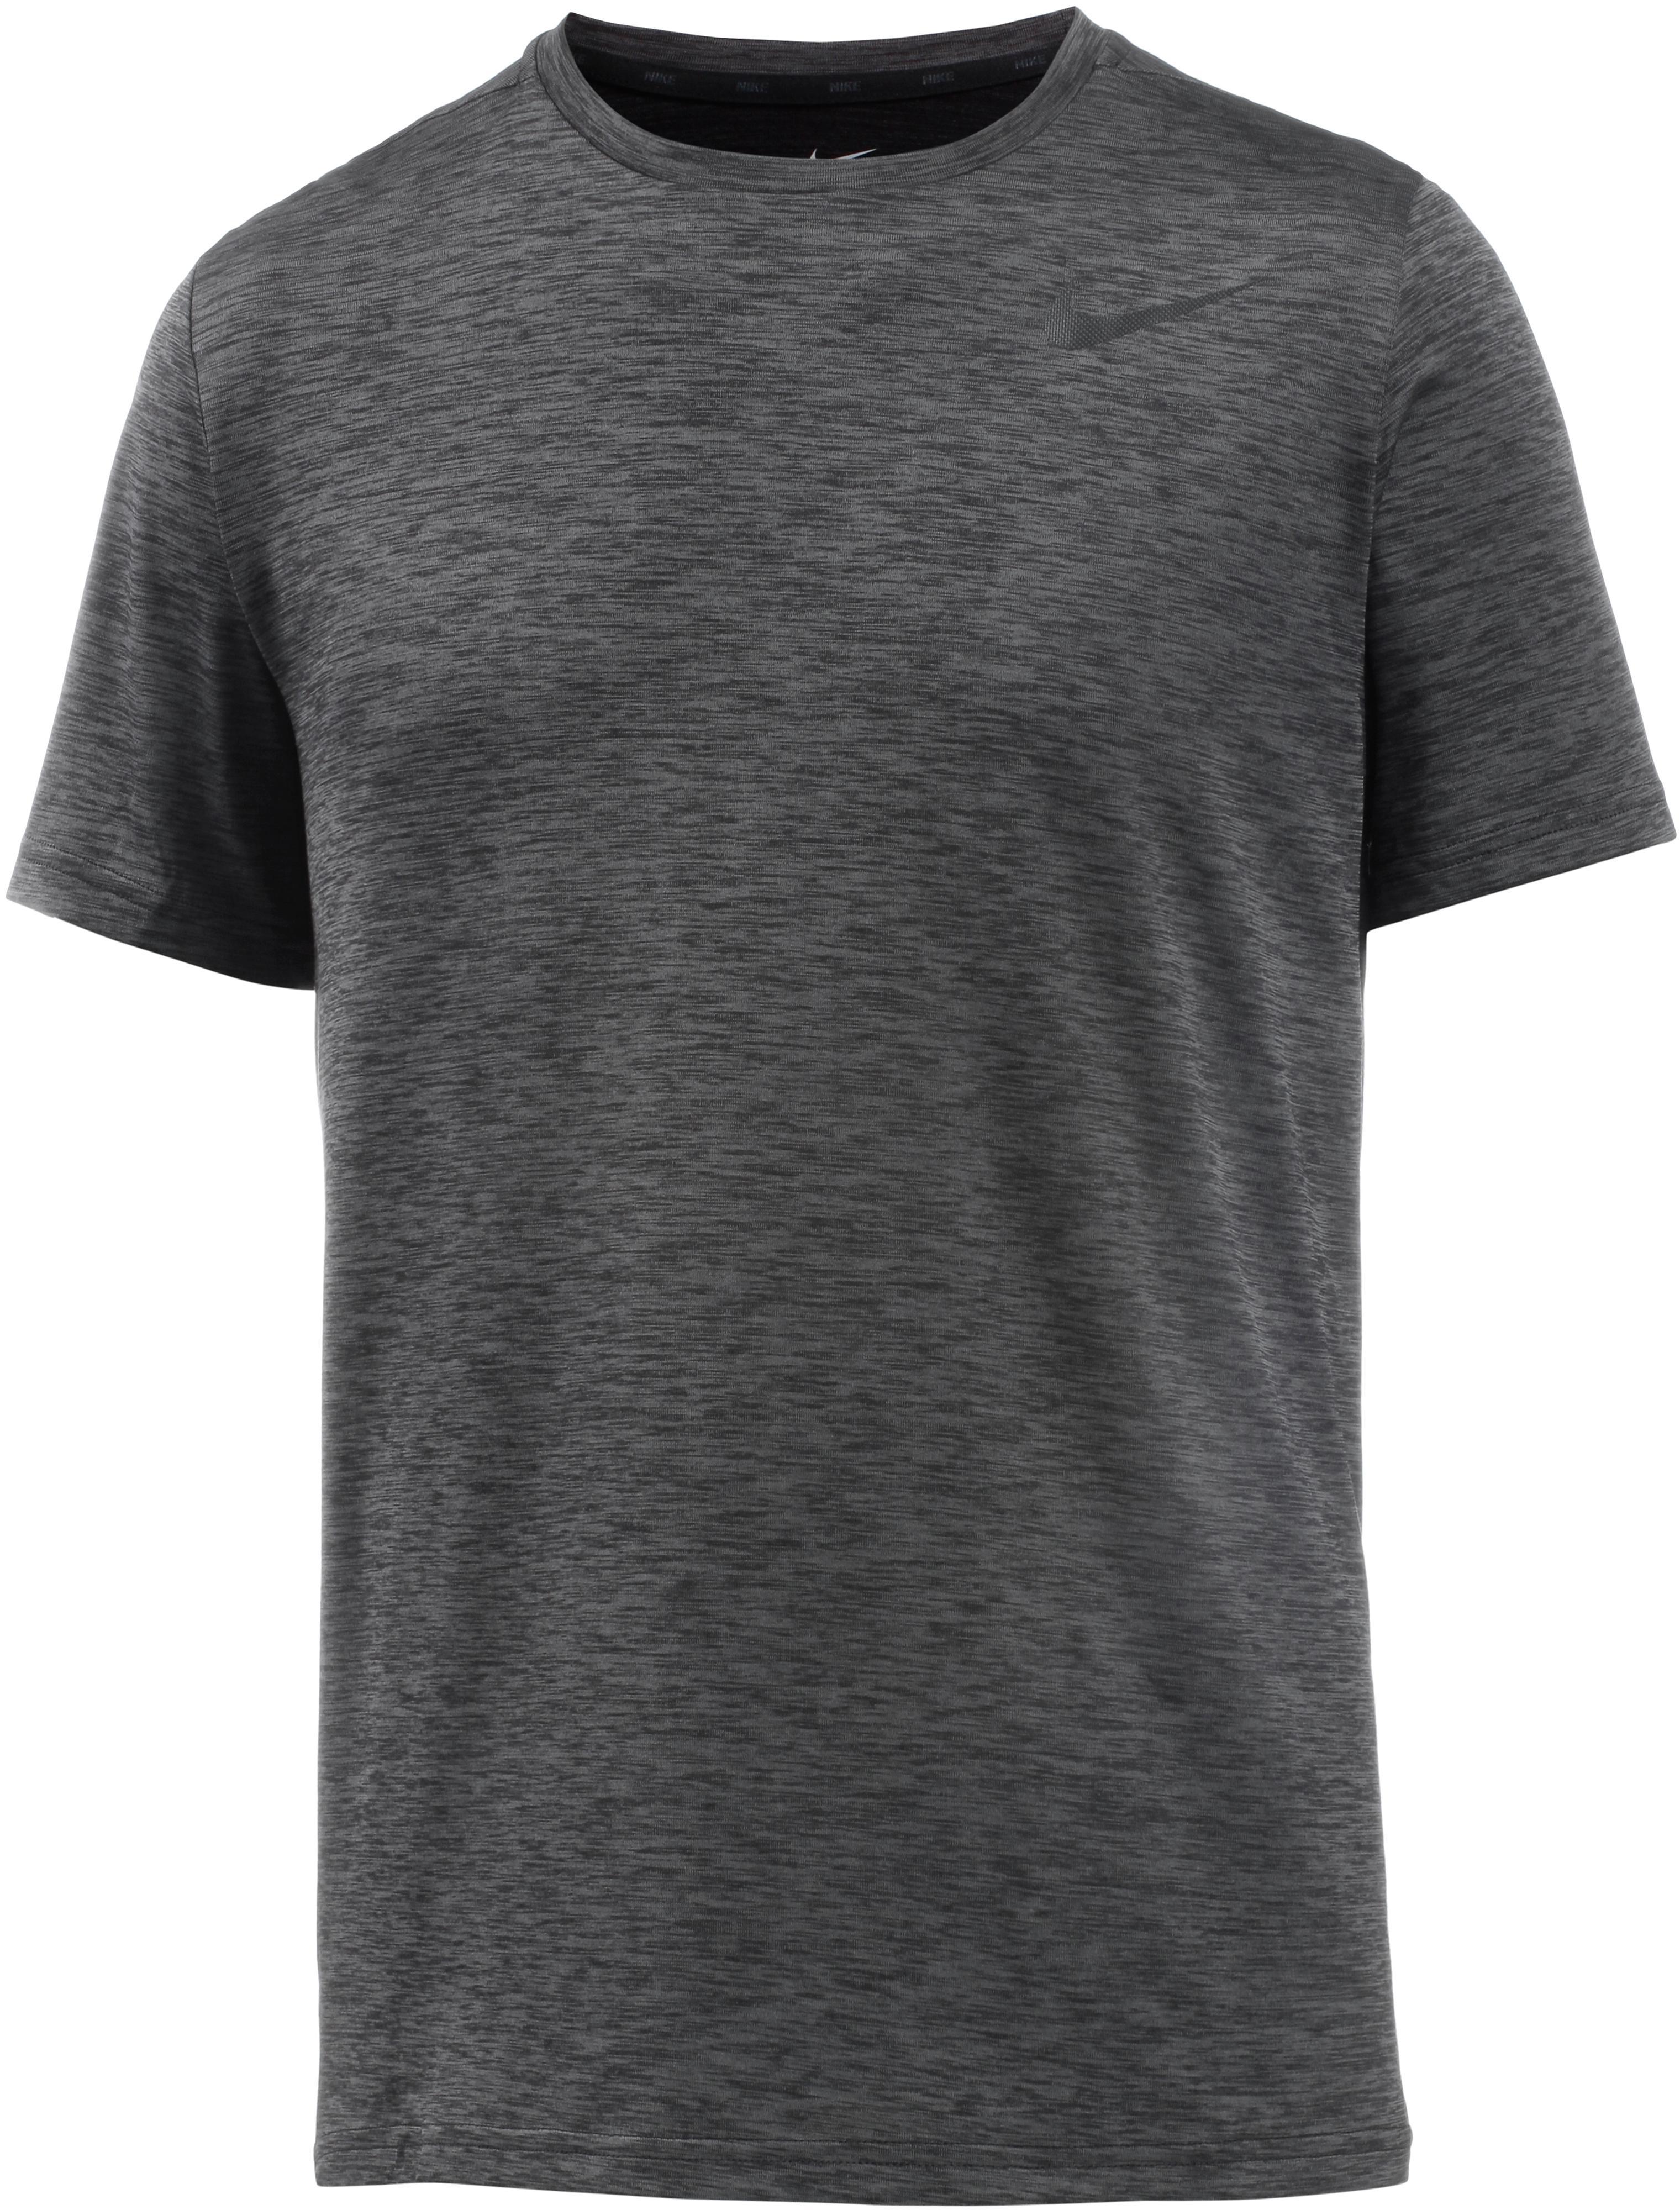 69dc6c827ff60b Herren Online Breathe Shop Funktionsshirt Hyper Dry Im Schwarz Nike 8PqIaUI